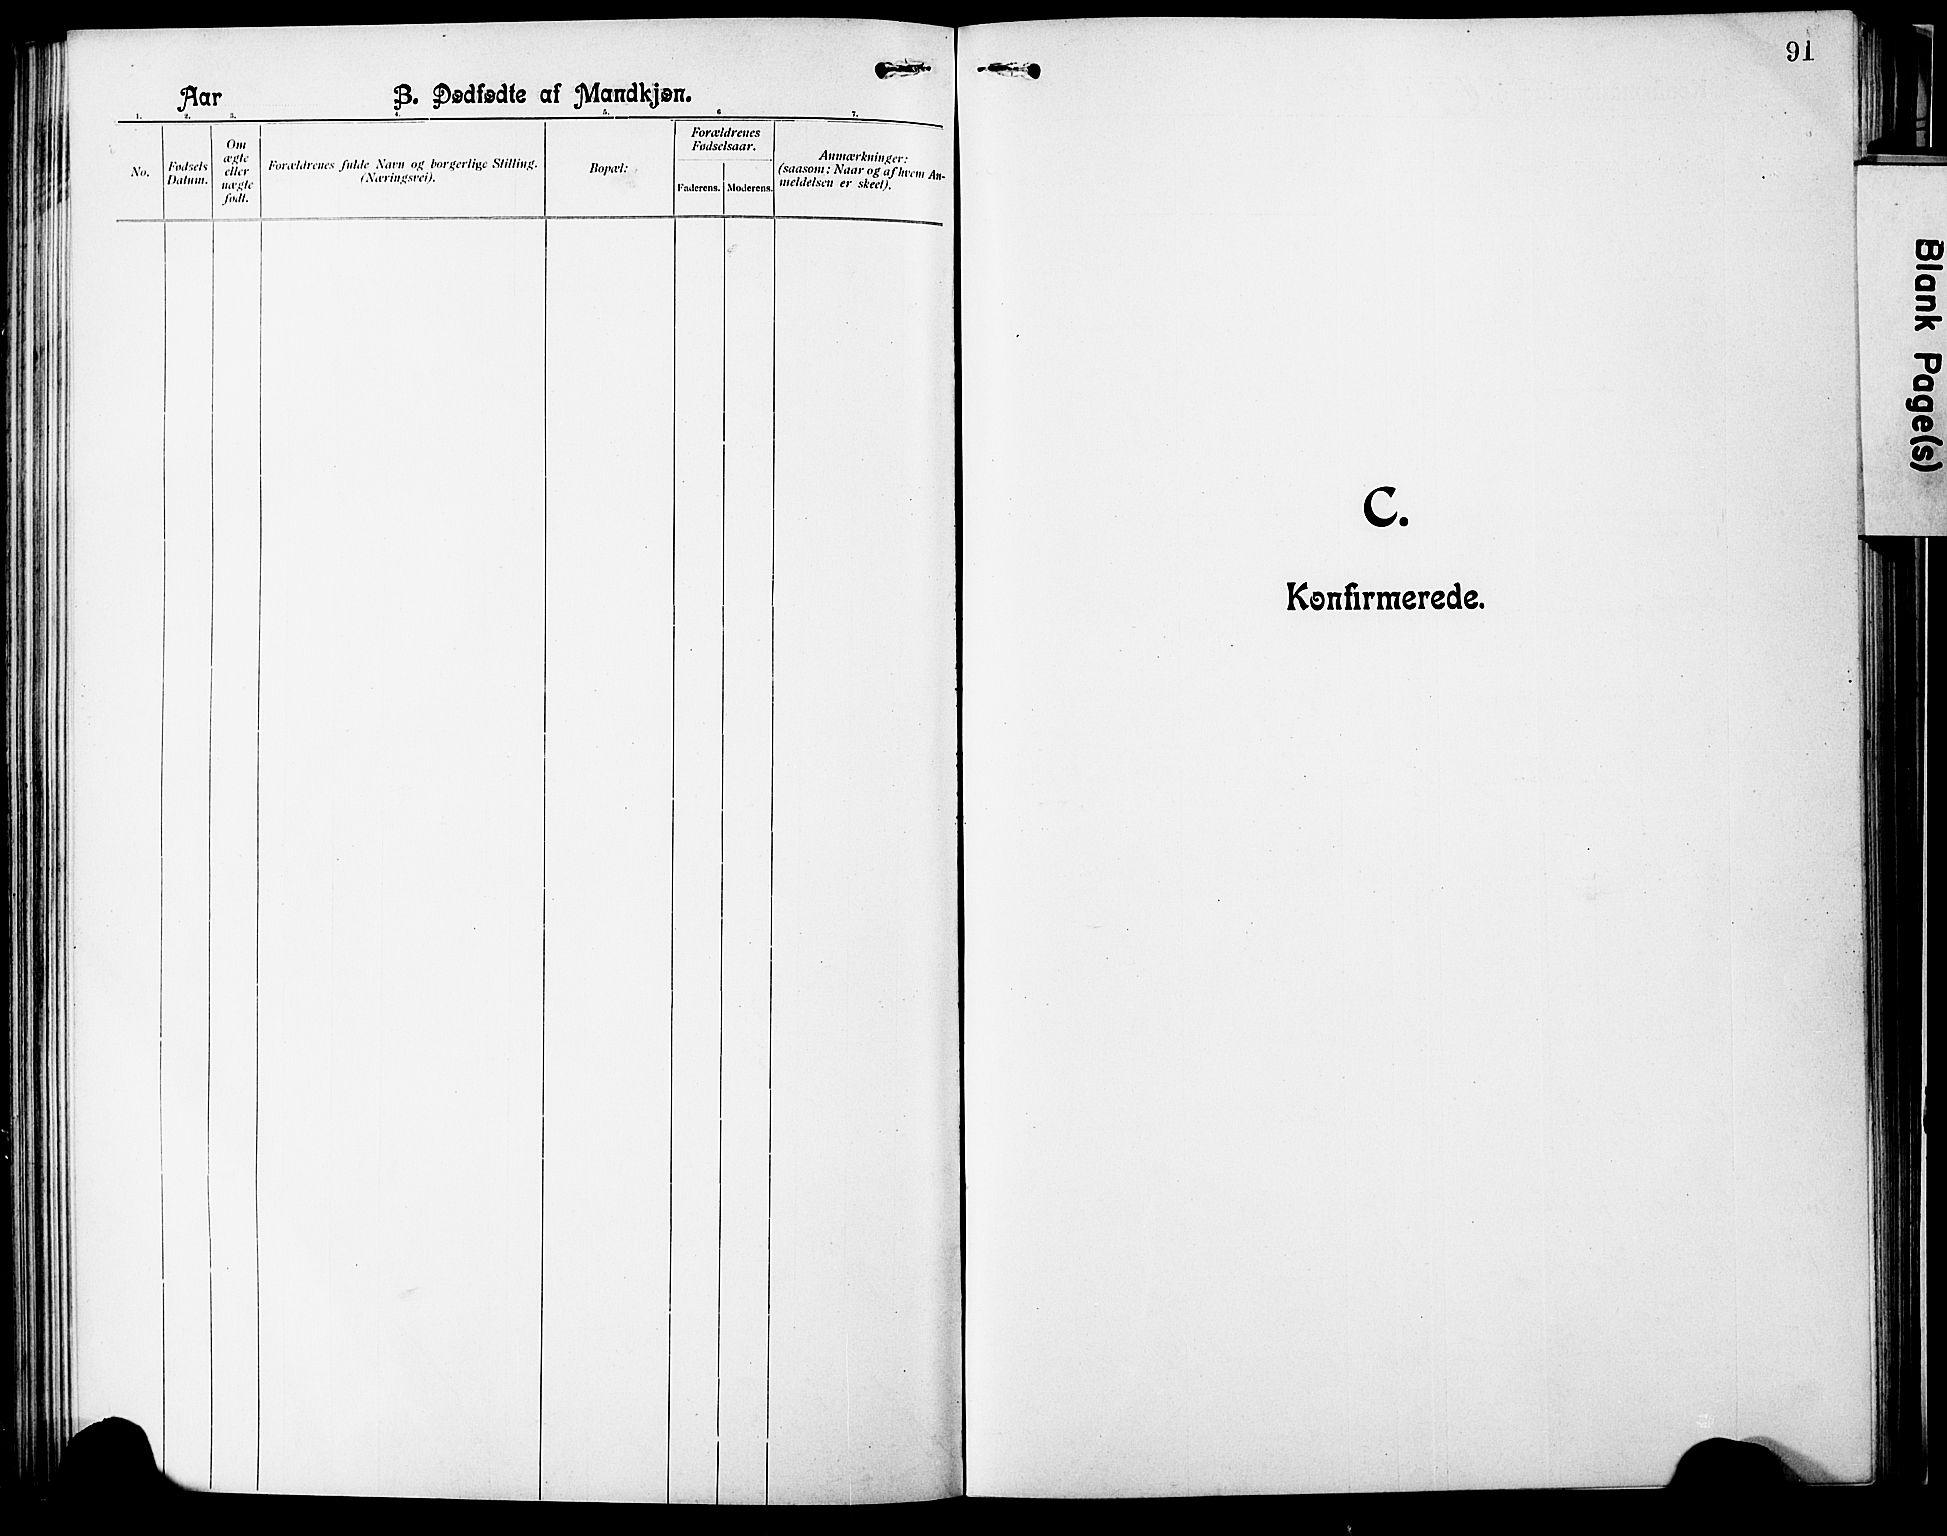 SAT, Ministerialprotokoller, klokkerbøker og fødselsregistre - Nordland, 803/L0077: Klokkerbok nr. 803C04, 1897-1930, s. 91